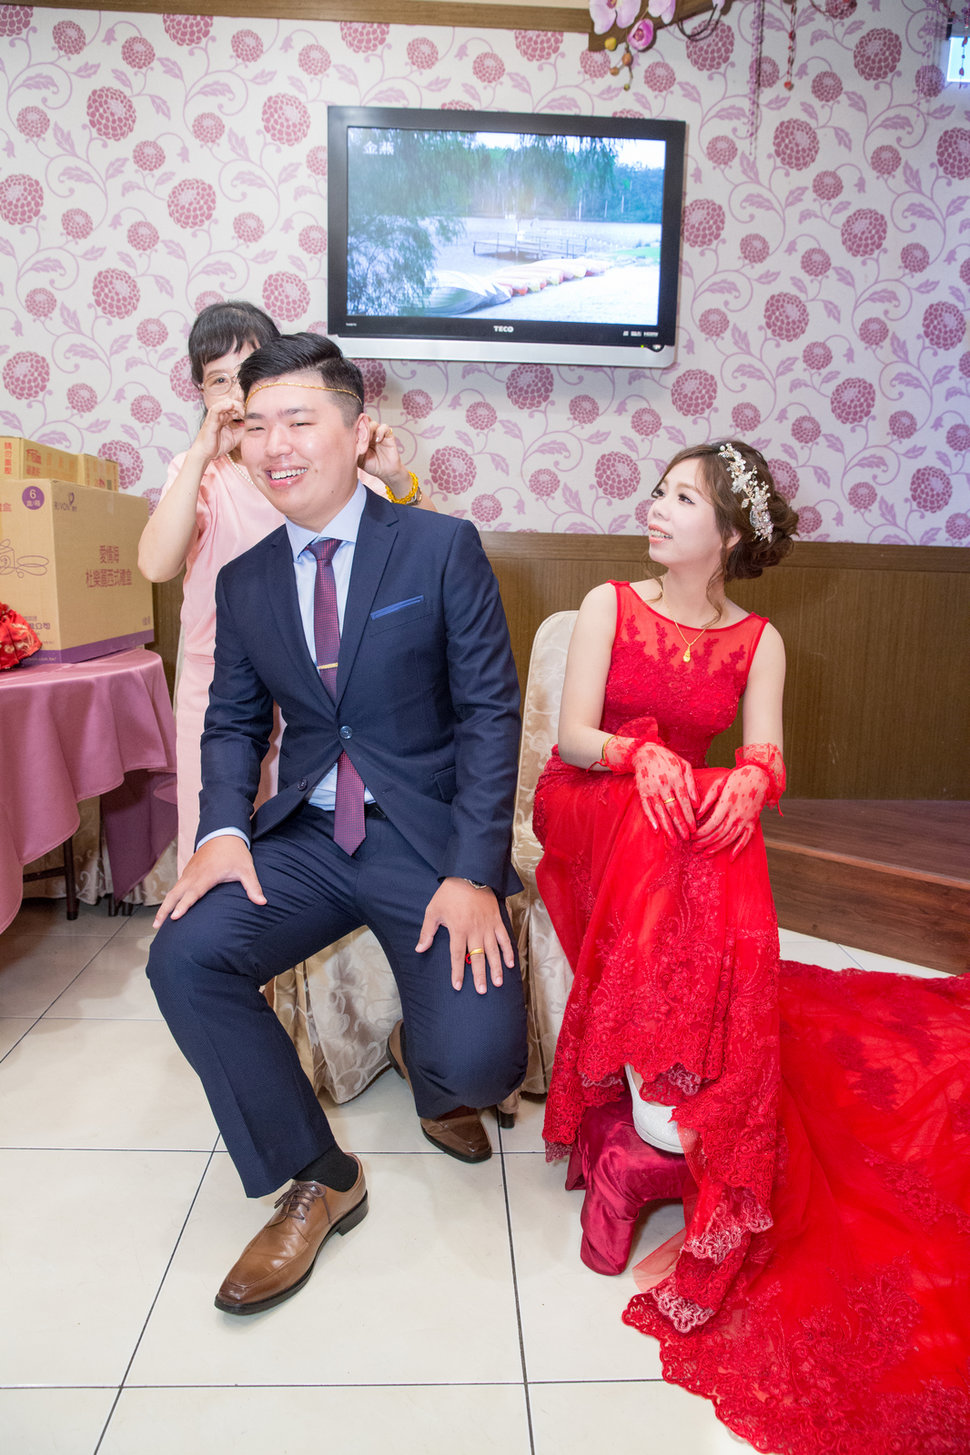 HANK9629 - 蛋拔婚禮紀錄 - 結婚吧